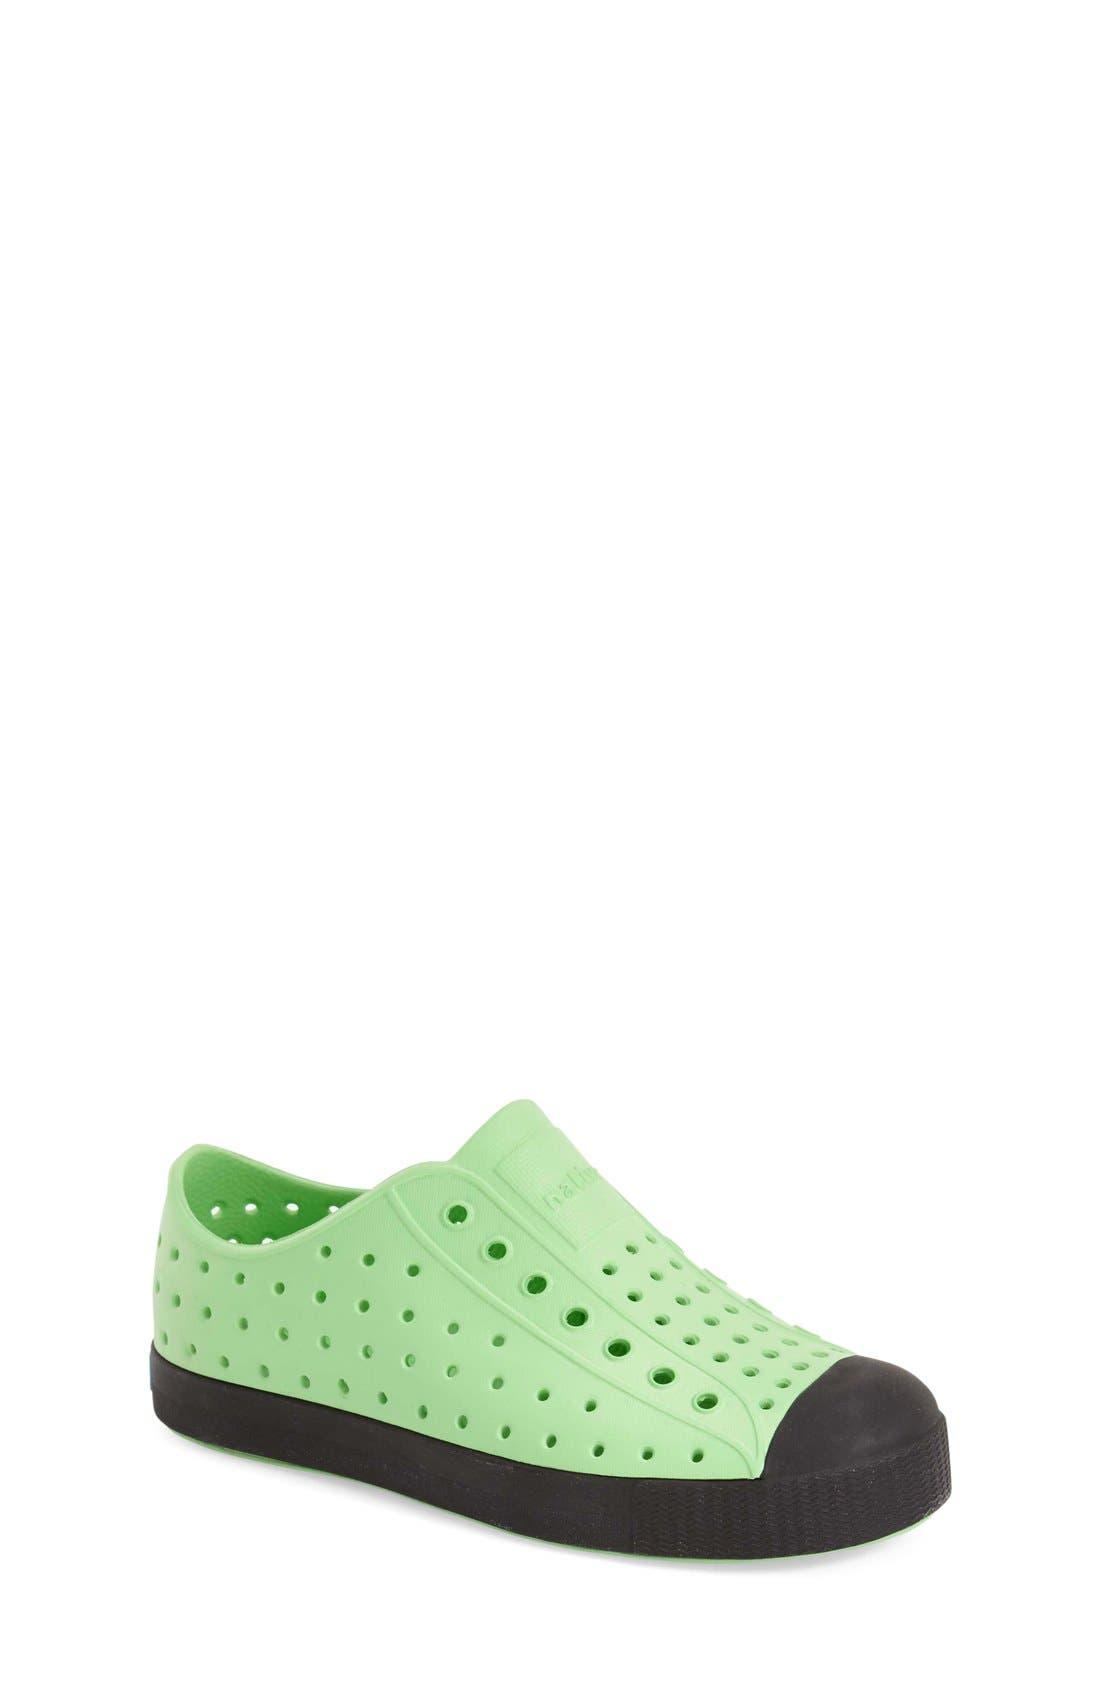 'Jefferson' Water Friendly Slip-On Sneaker,                             Main thumbnail 40, color,